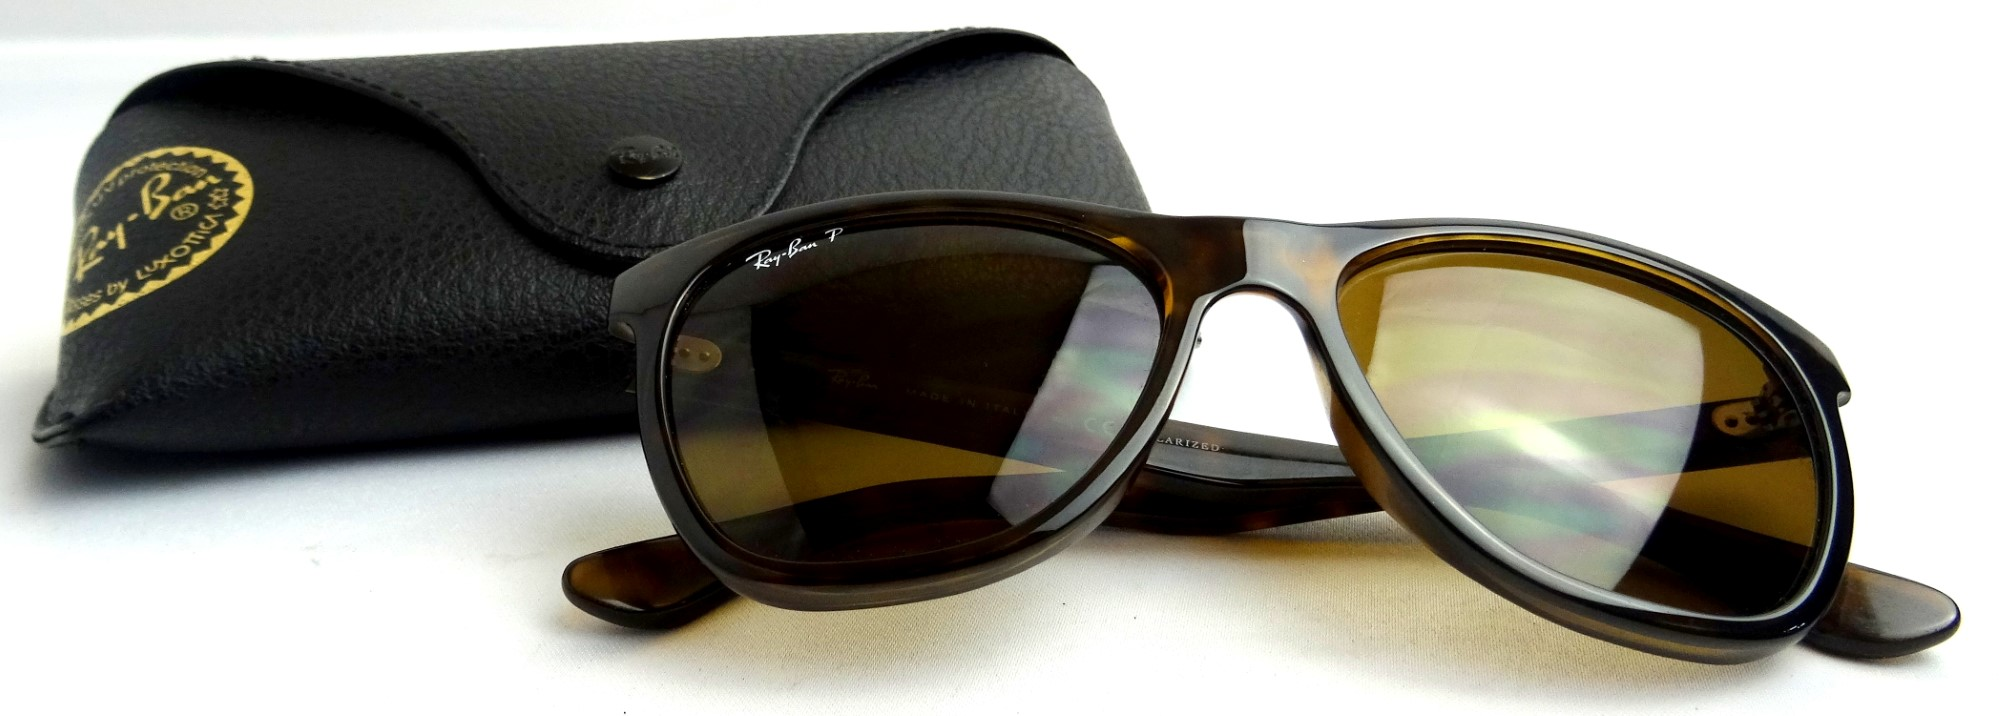 3b851c38f77 Women s Ray-Ban Highstreet Polarized sunglasses BROWN